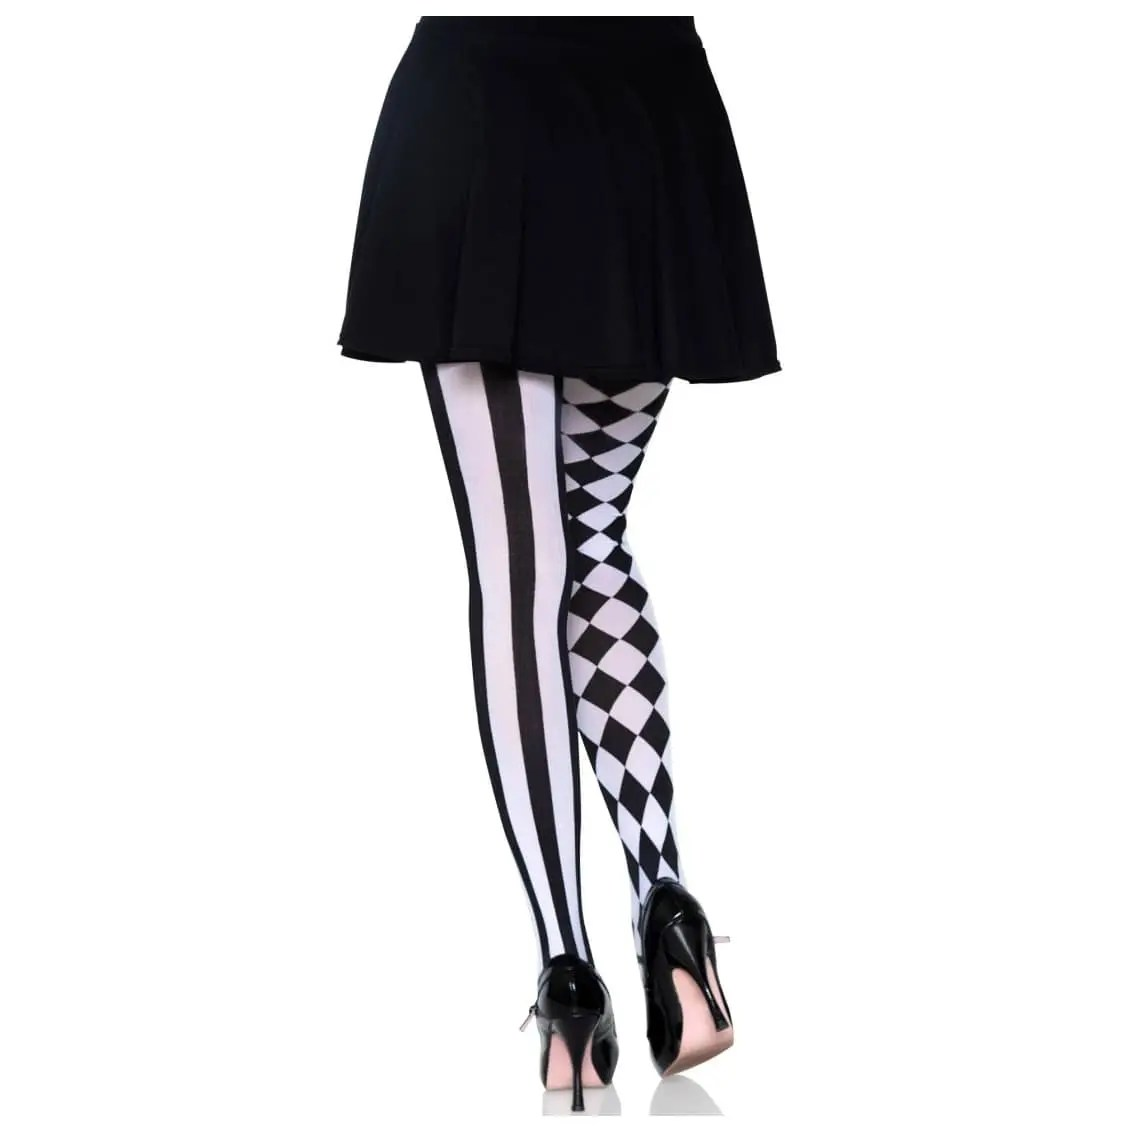 Aura Harlequin Women's Tights by Leg Avenue